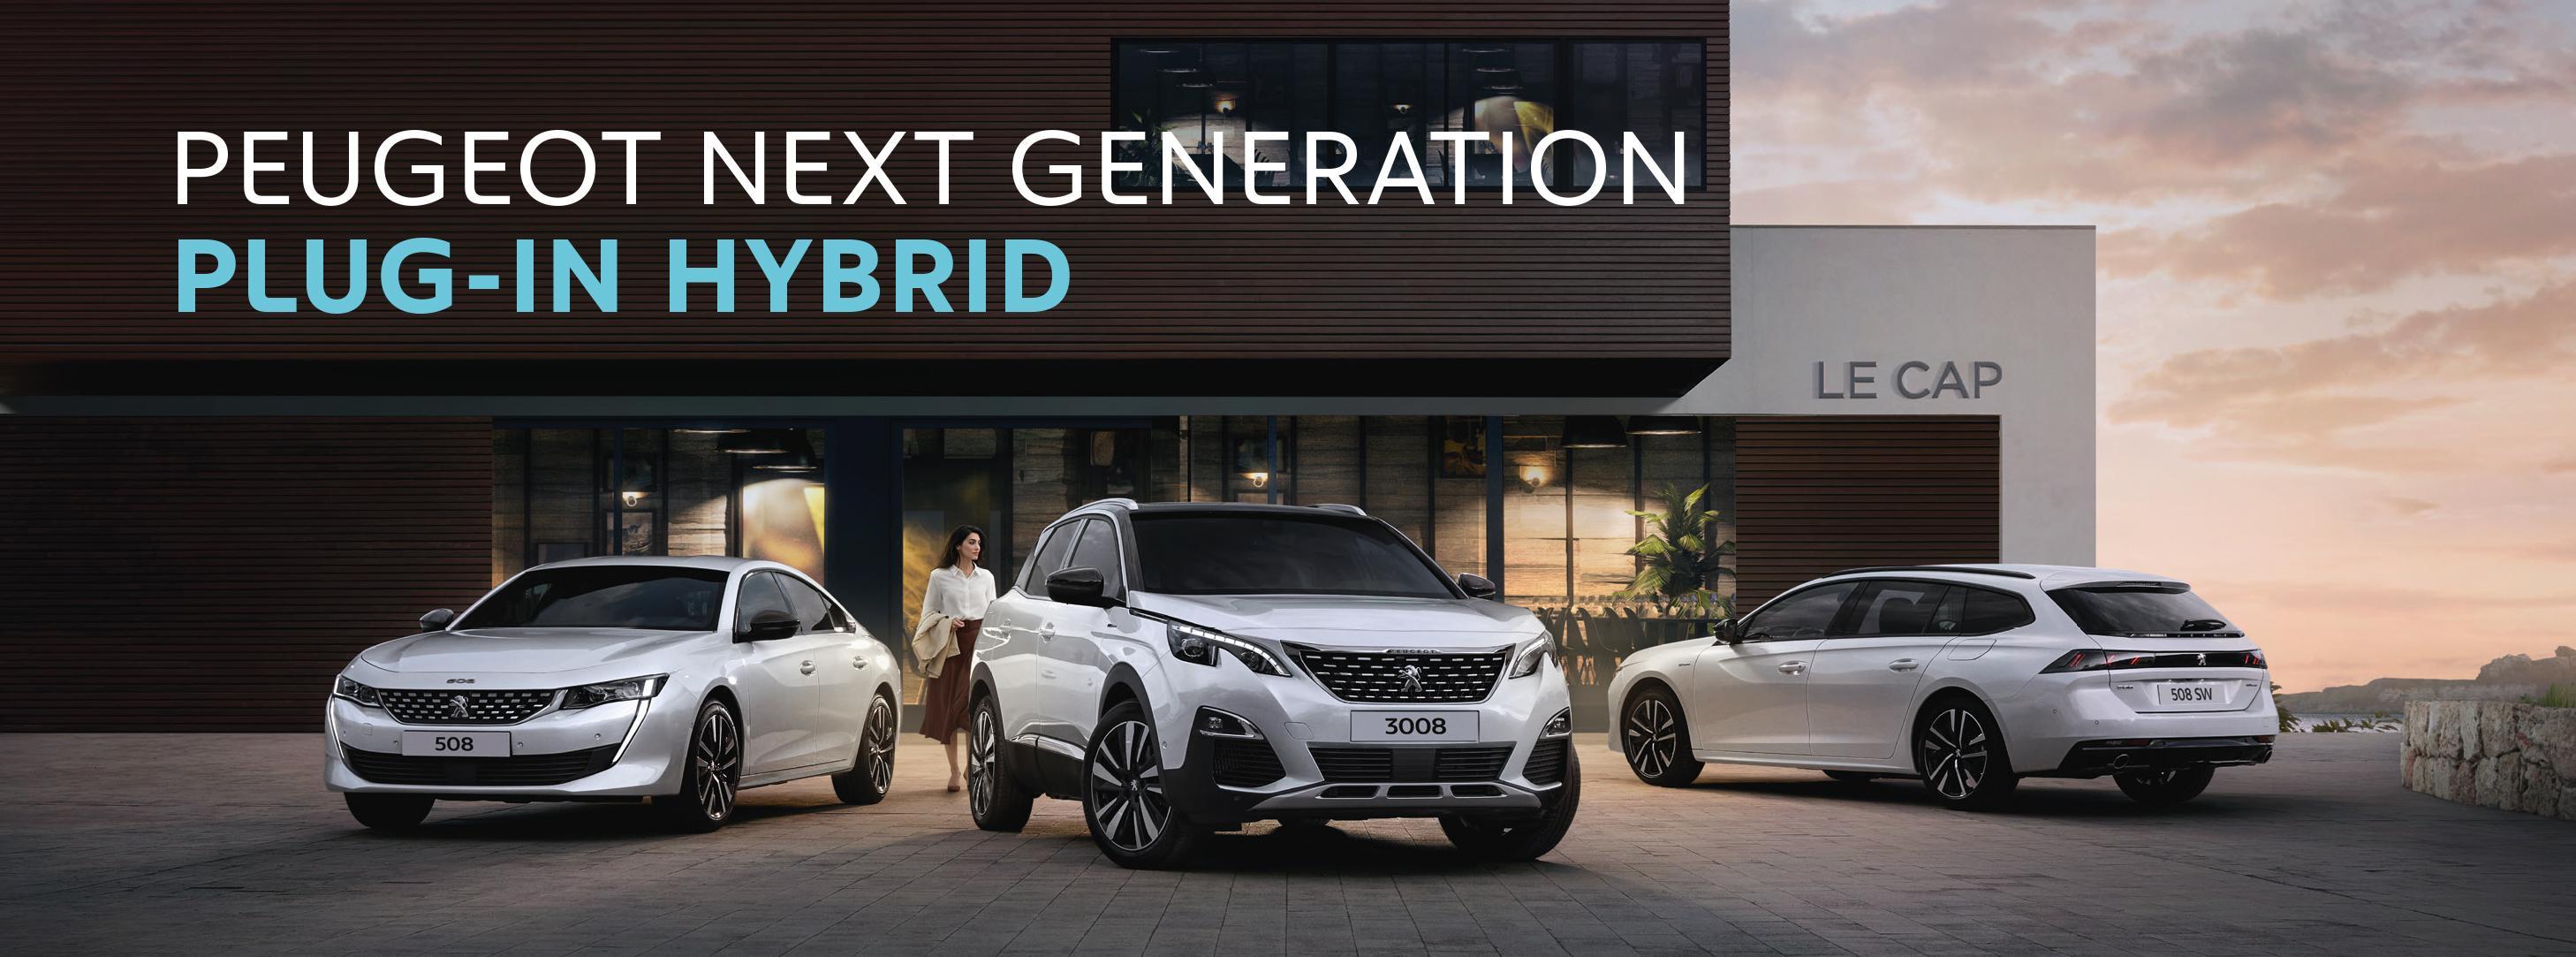 Die Plug-In Hybrid Flotte von Peugeot -